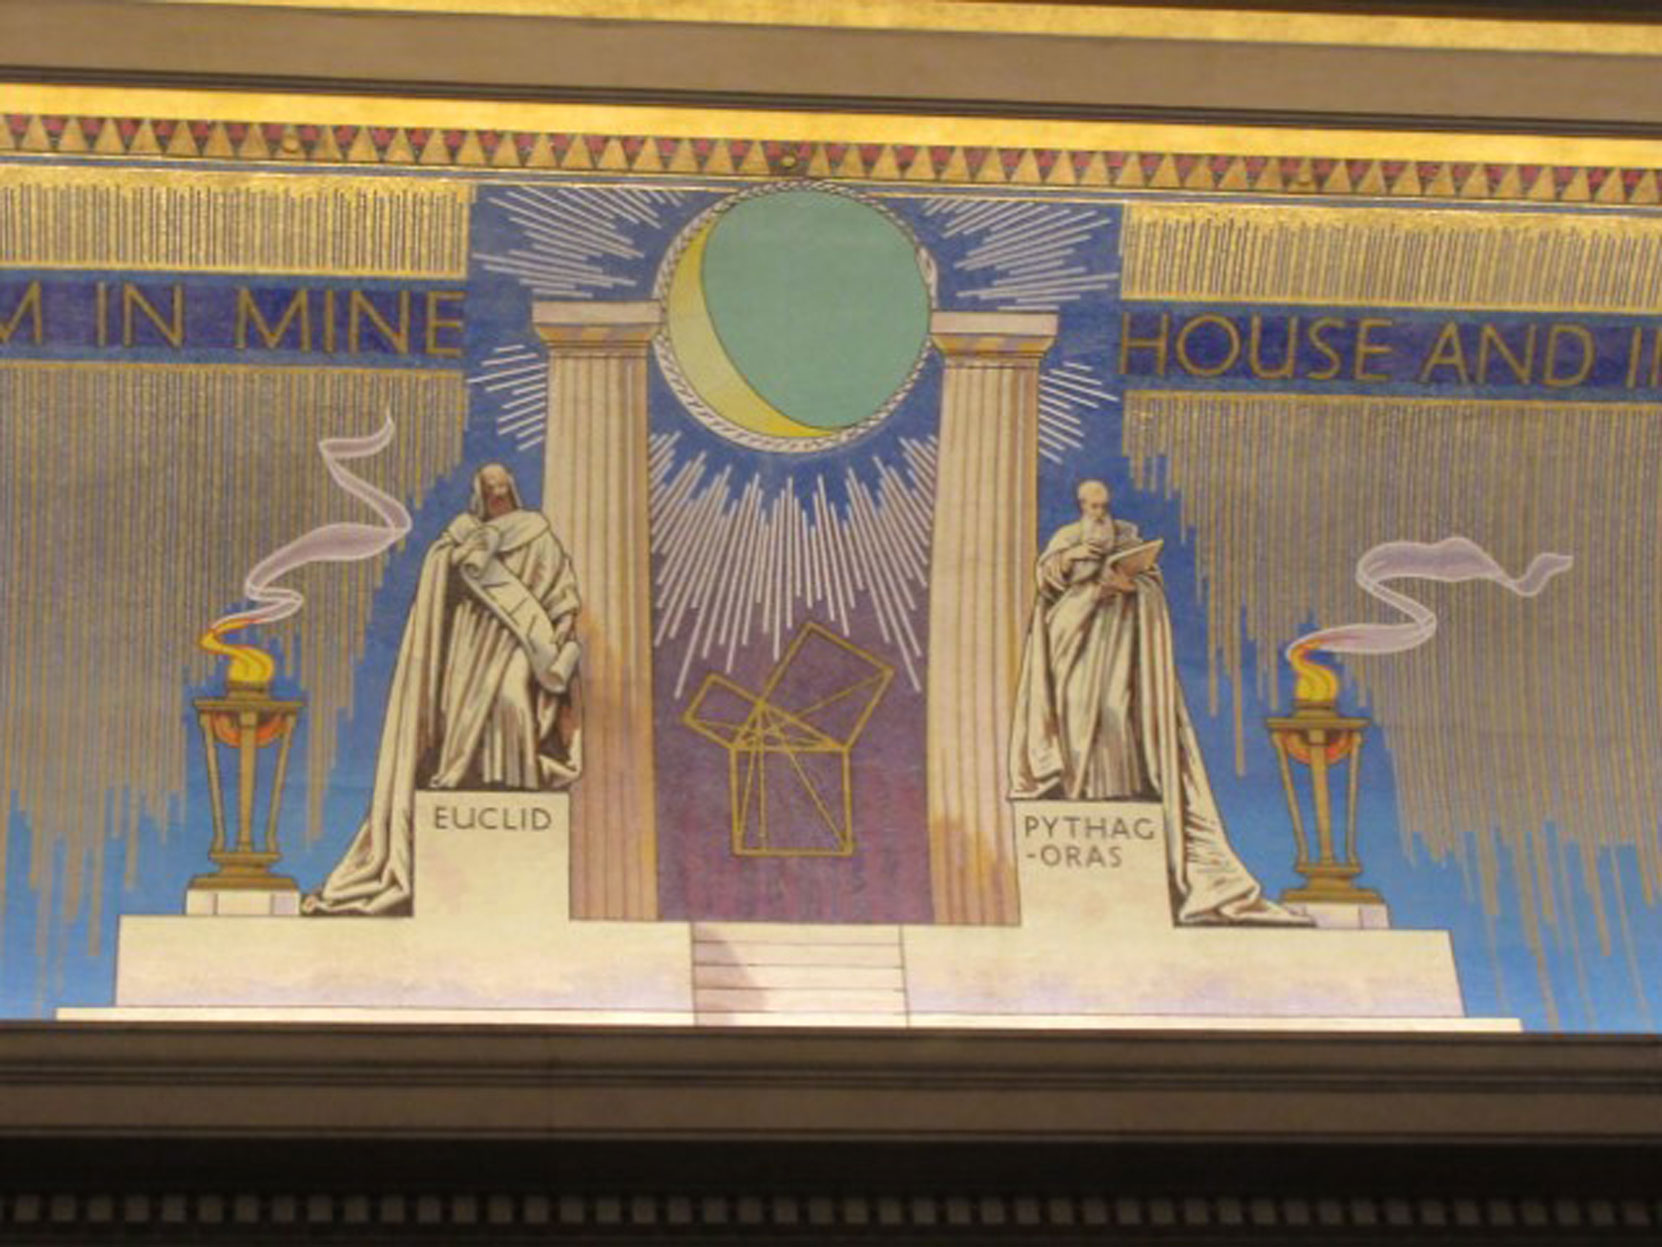 West Ceiling, Freemasons Hall, London, UK, July 2018 (photo by Paul Philcox)